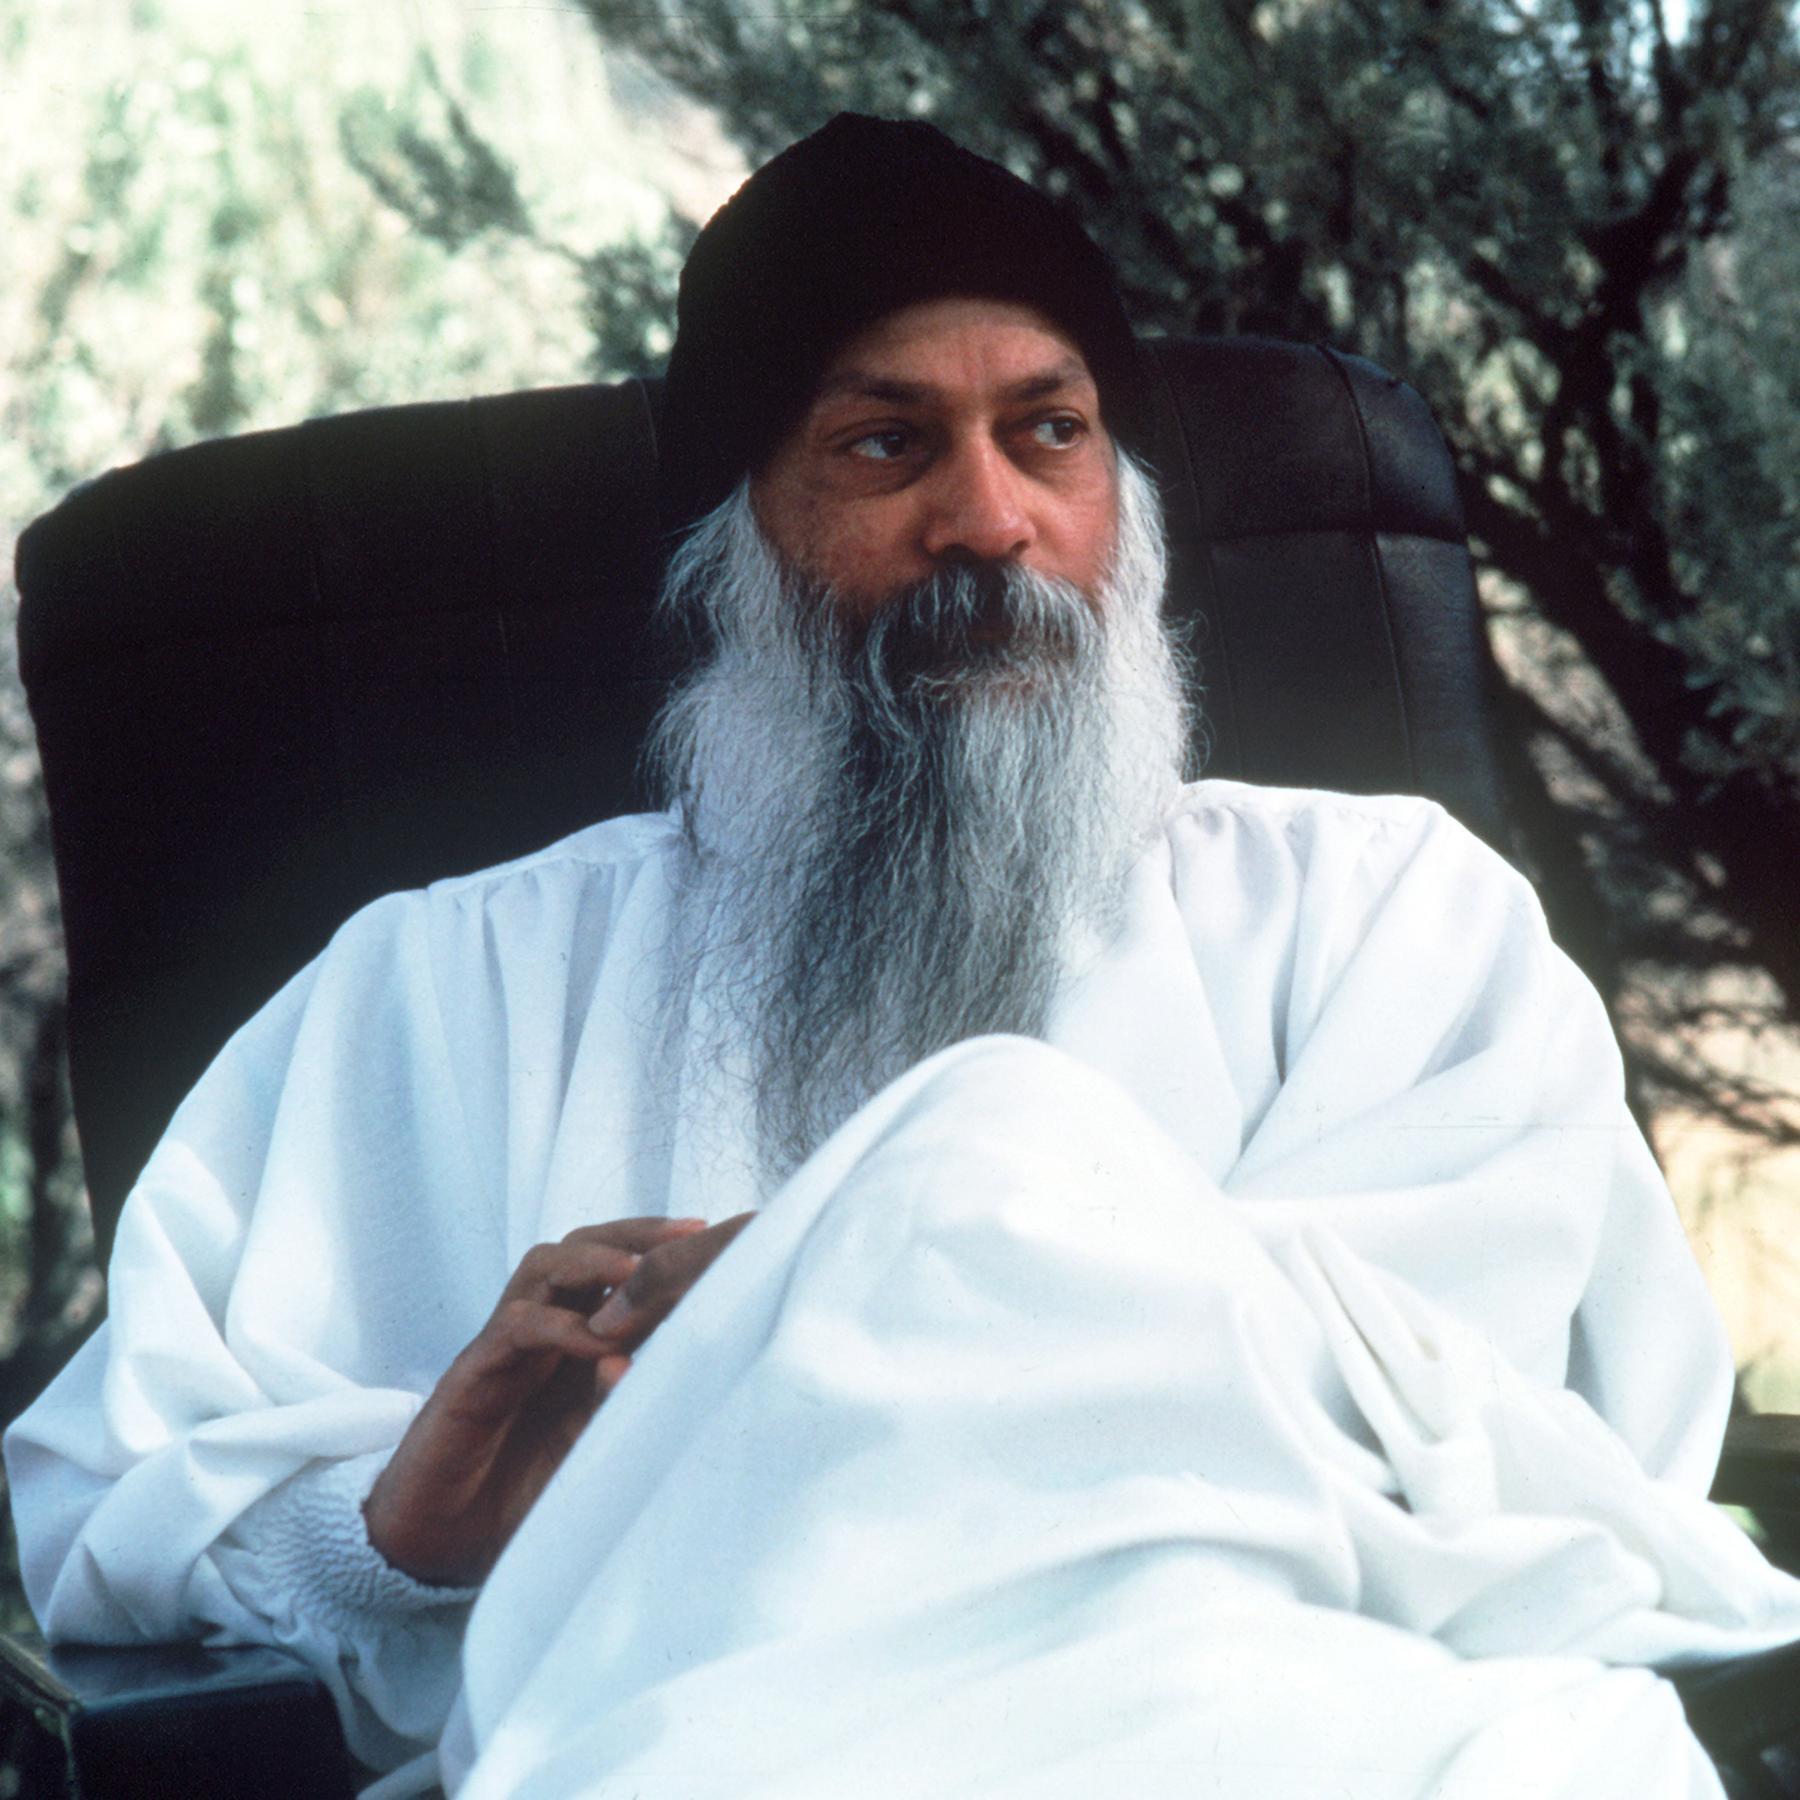 Rajneesh, Bhagwan, Osho - Der Guru der 70er